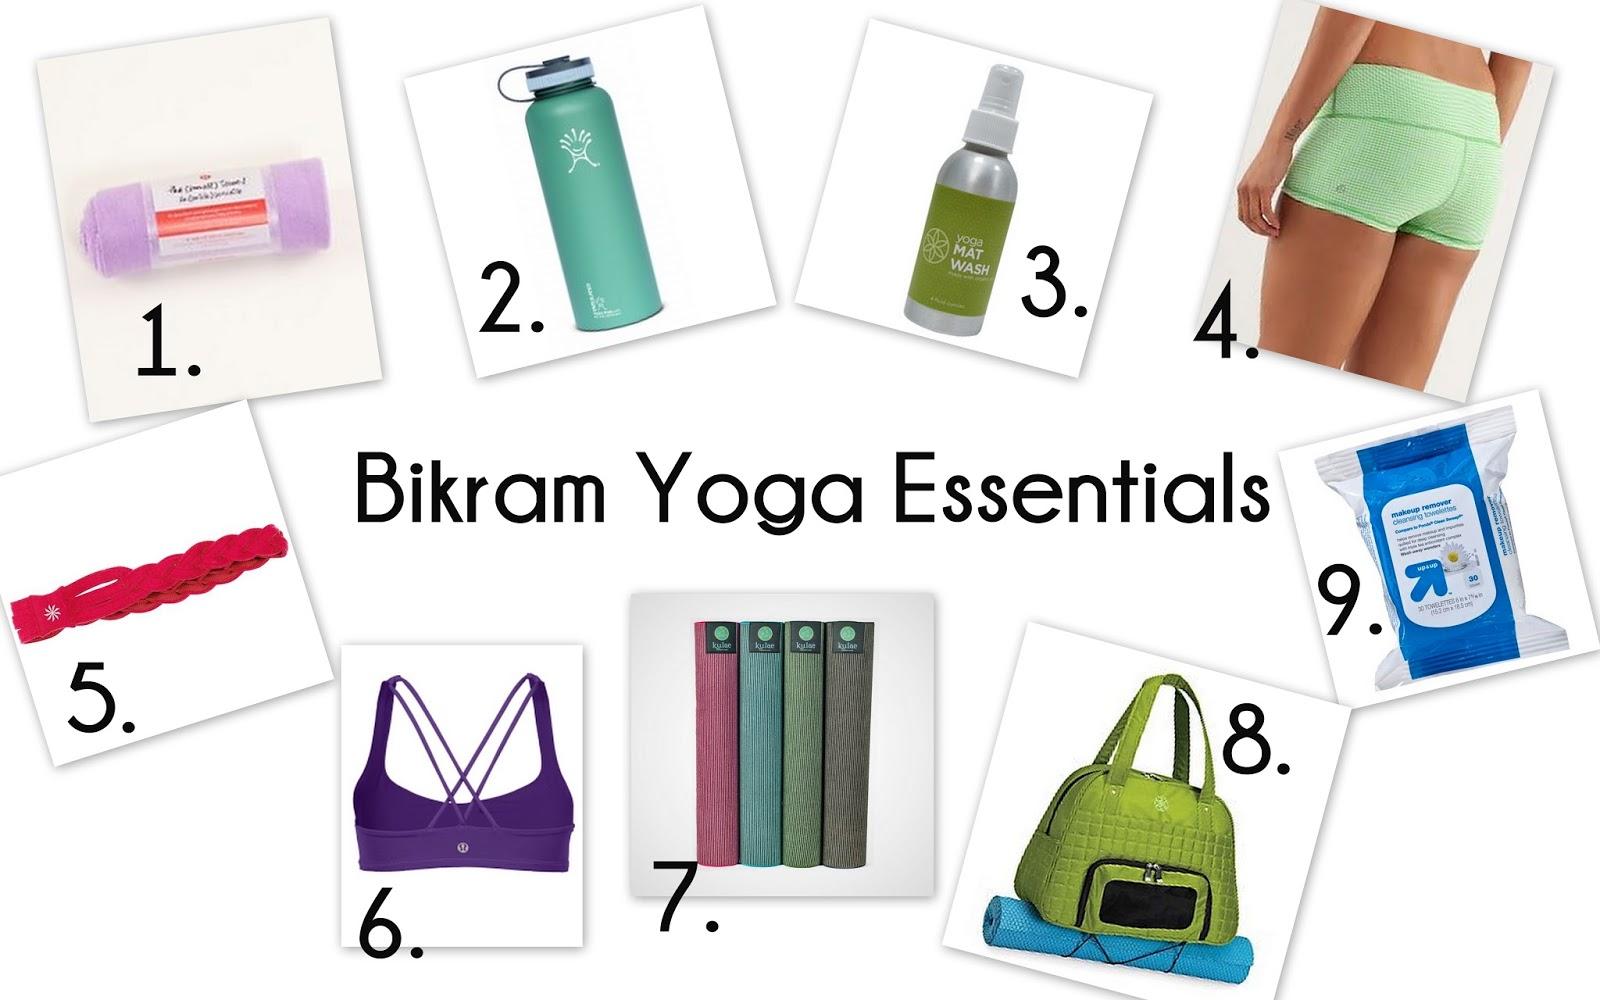 Bikram Yoga Essentials